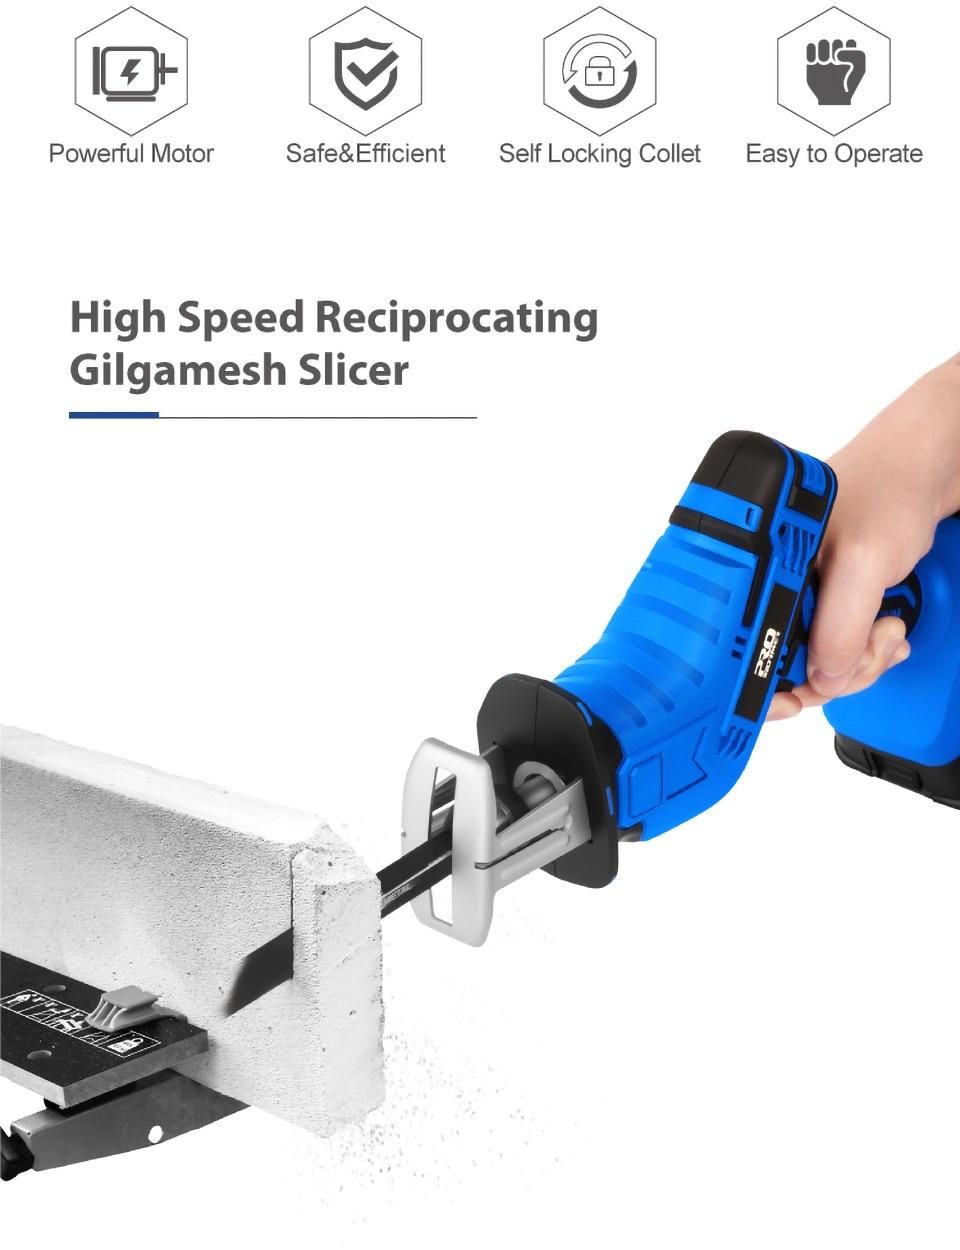 High Speed Reciprocating gilgamesh slicer